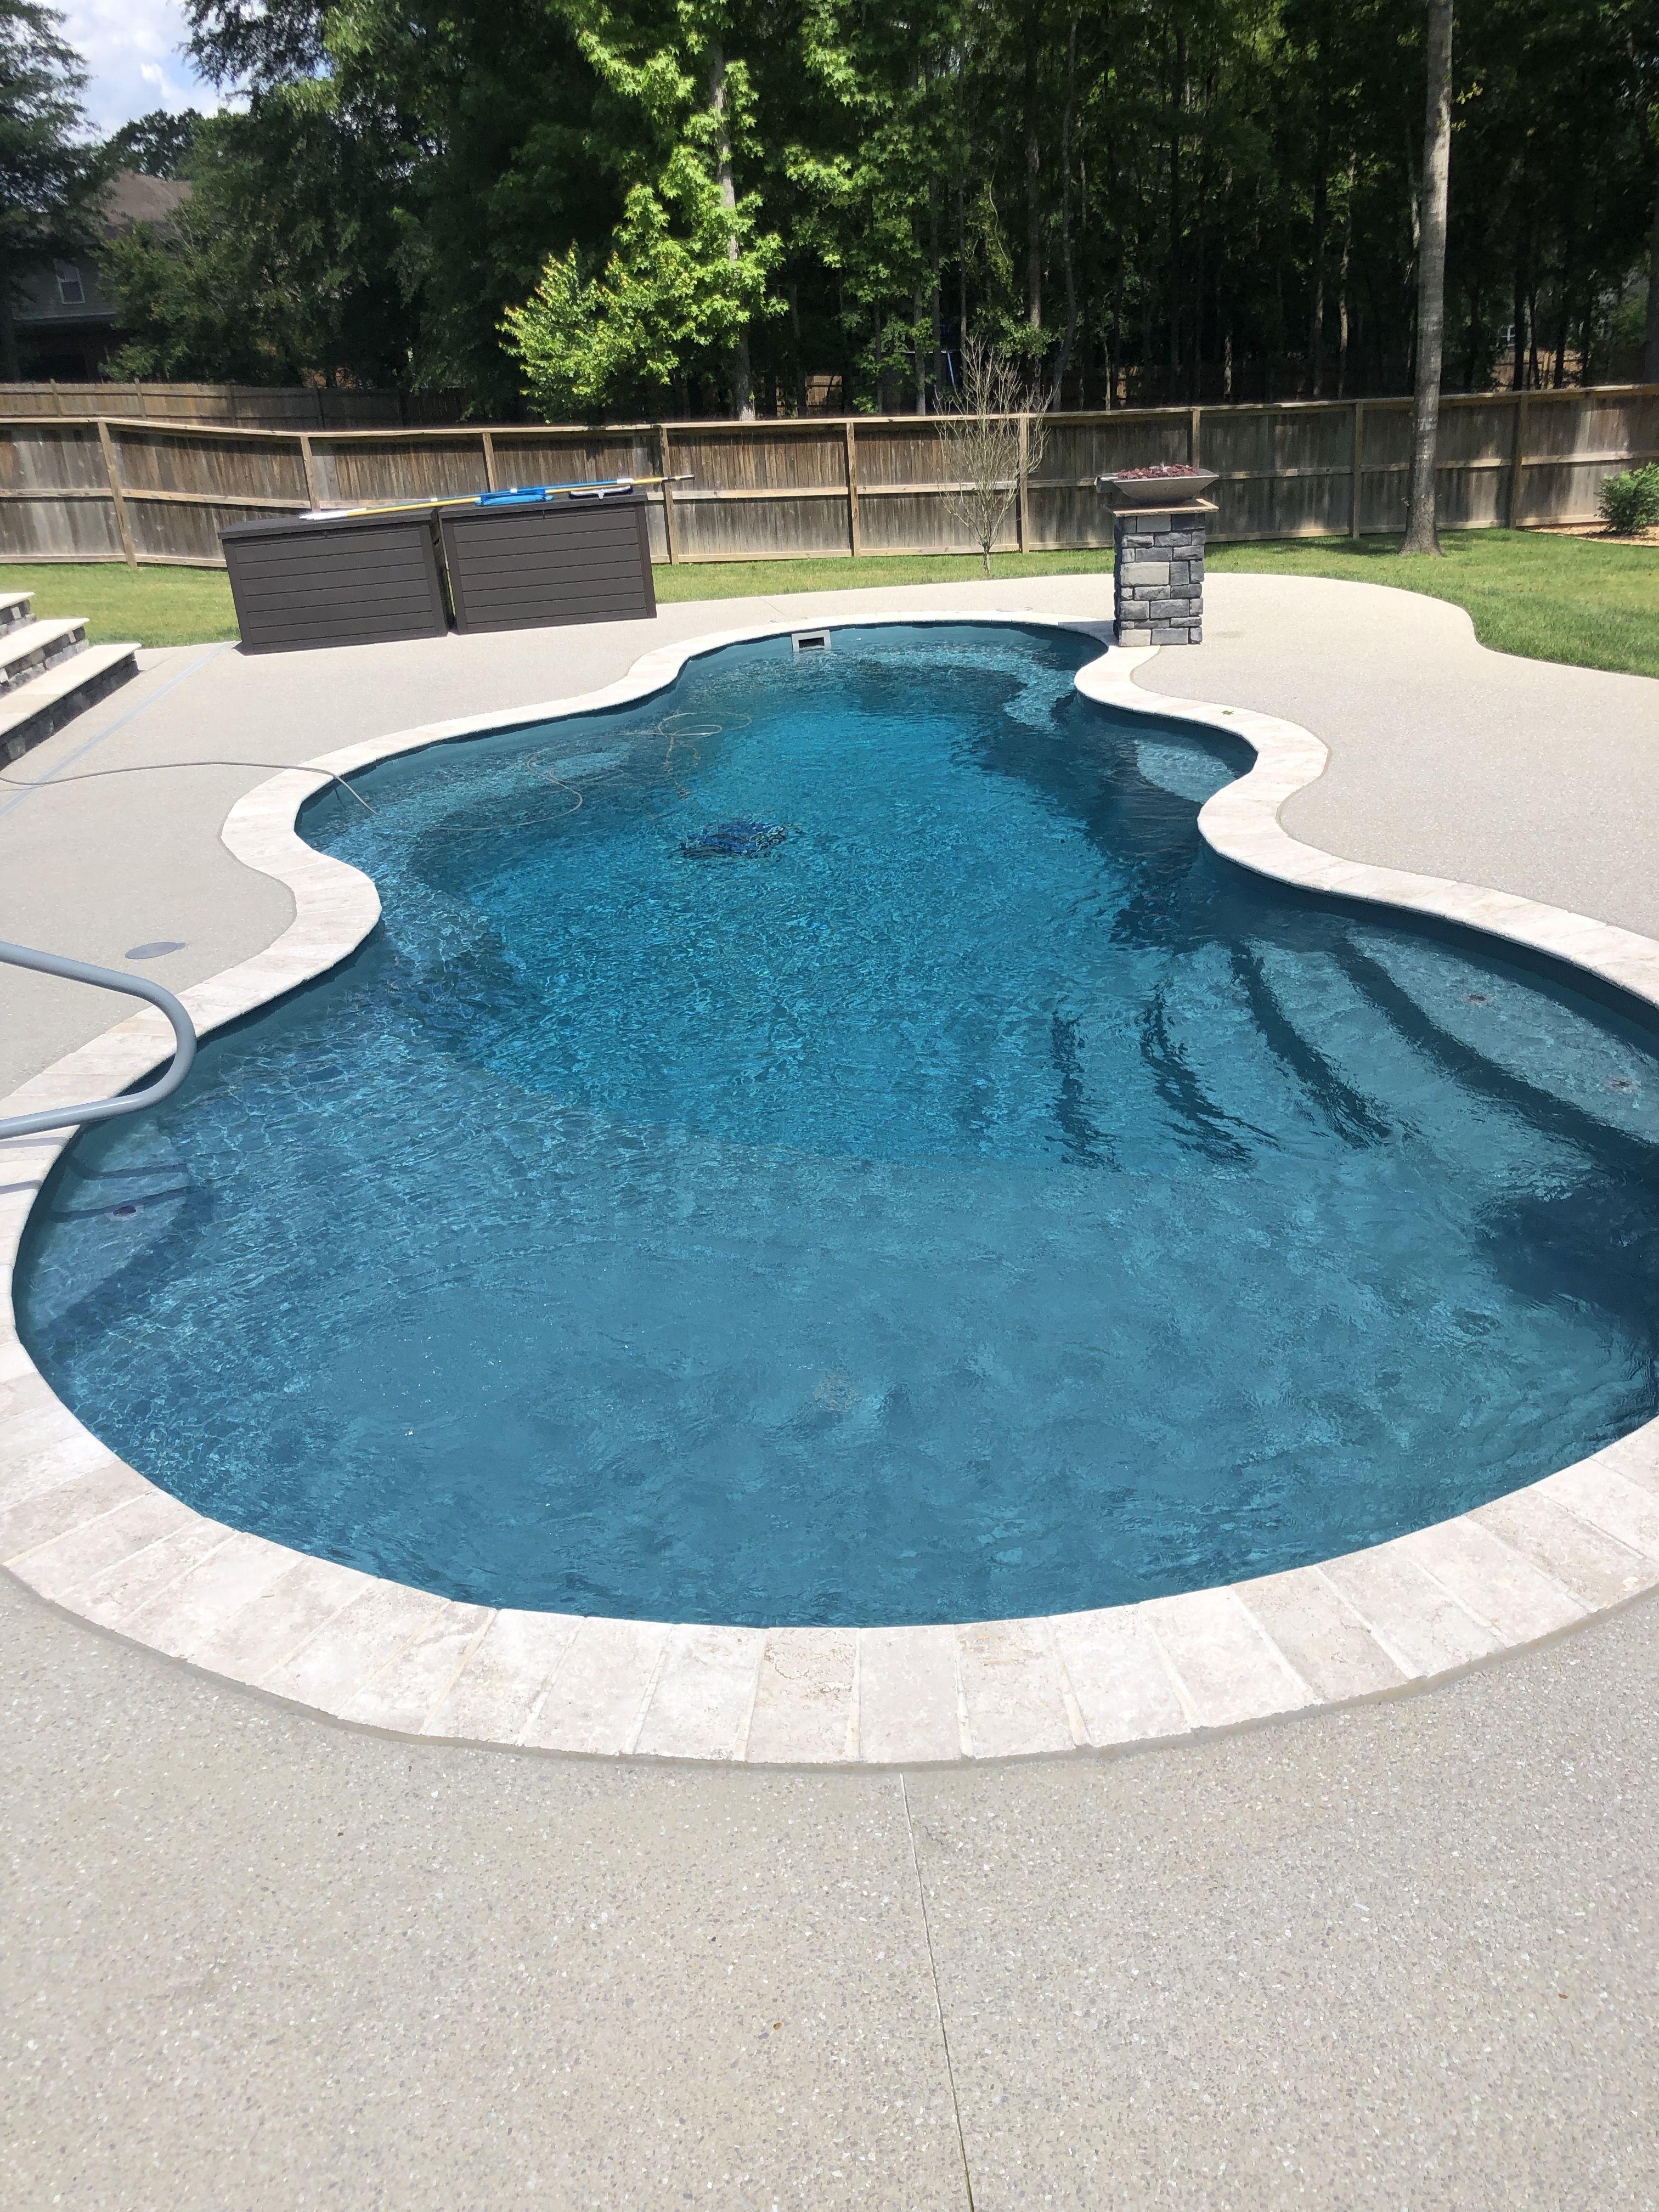 Trilogy Axiom Fiberglass Pool With Baja Shelf Fiberglass Pools Pools Backyard Inground Dream Pools